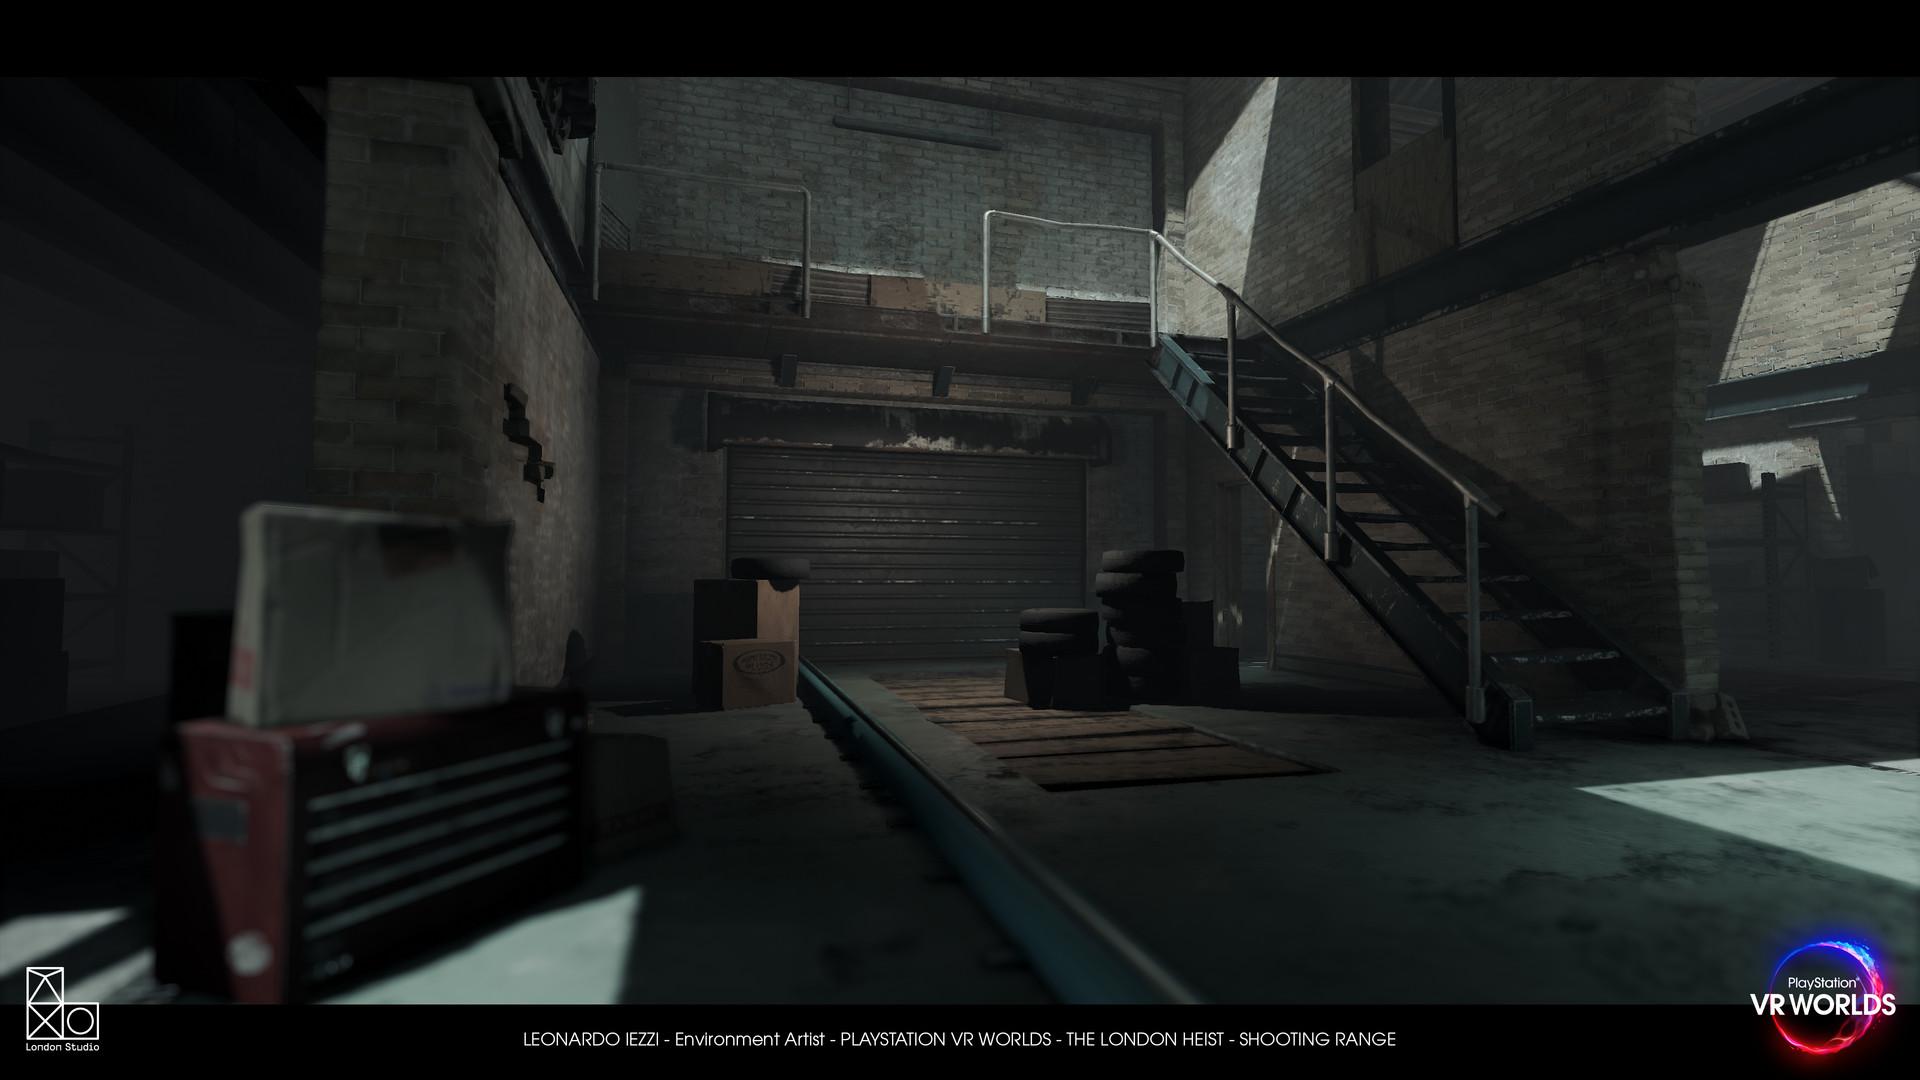 Leonardo iezzi leonardo iezzi environment artist vr worlds shooting range 04